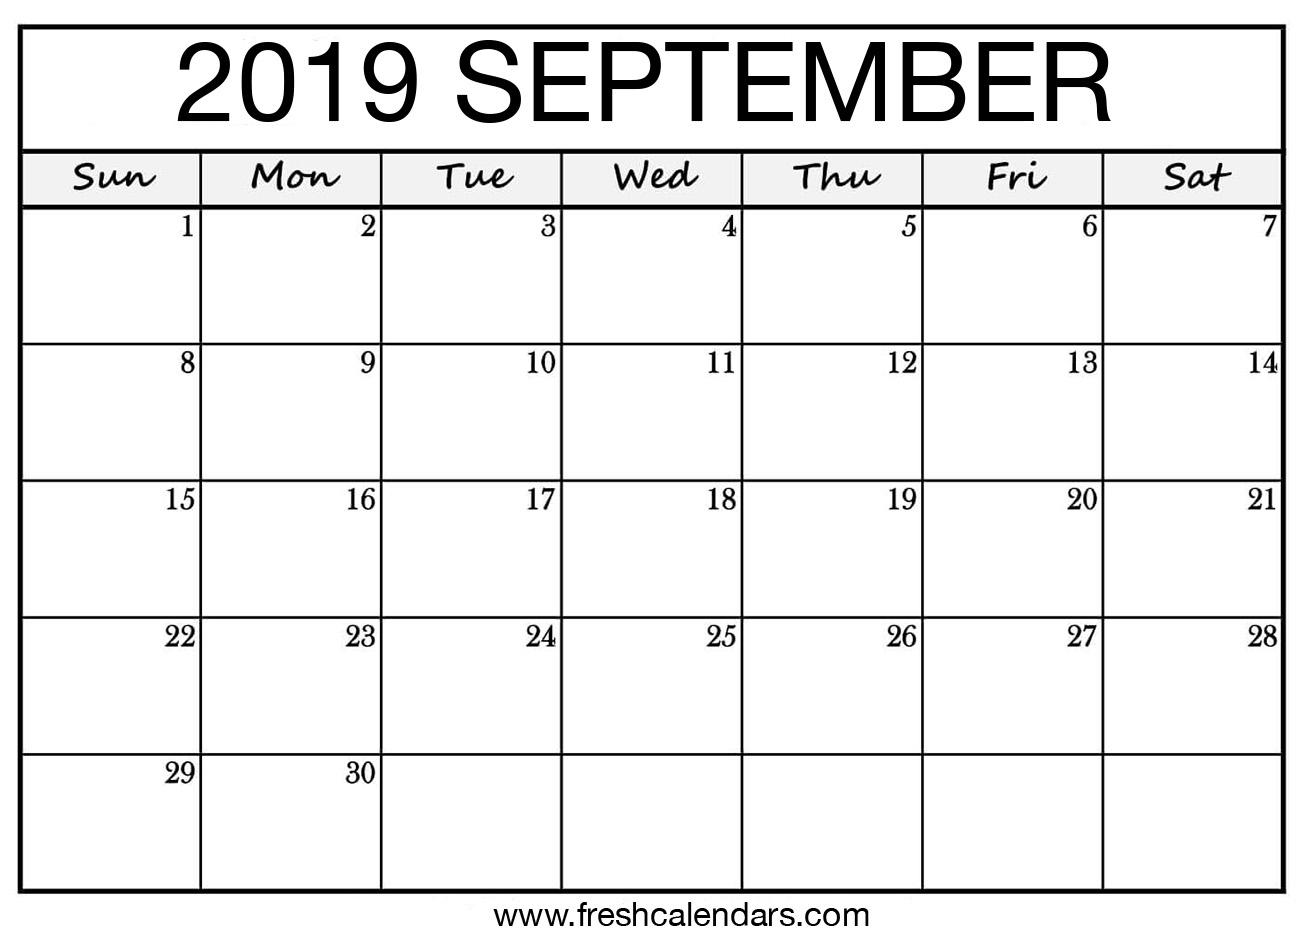 September 2019 Calendar Printable Fresh Calendars